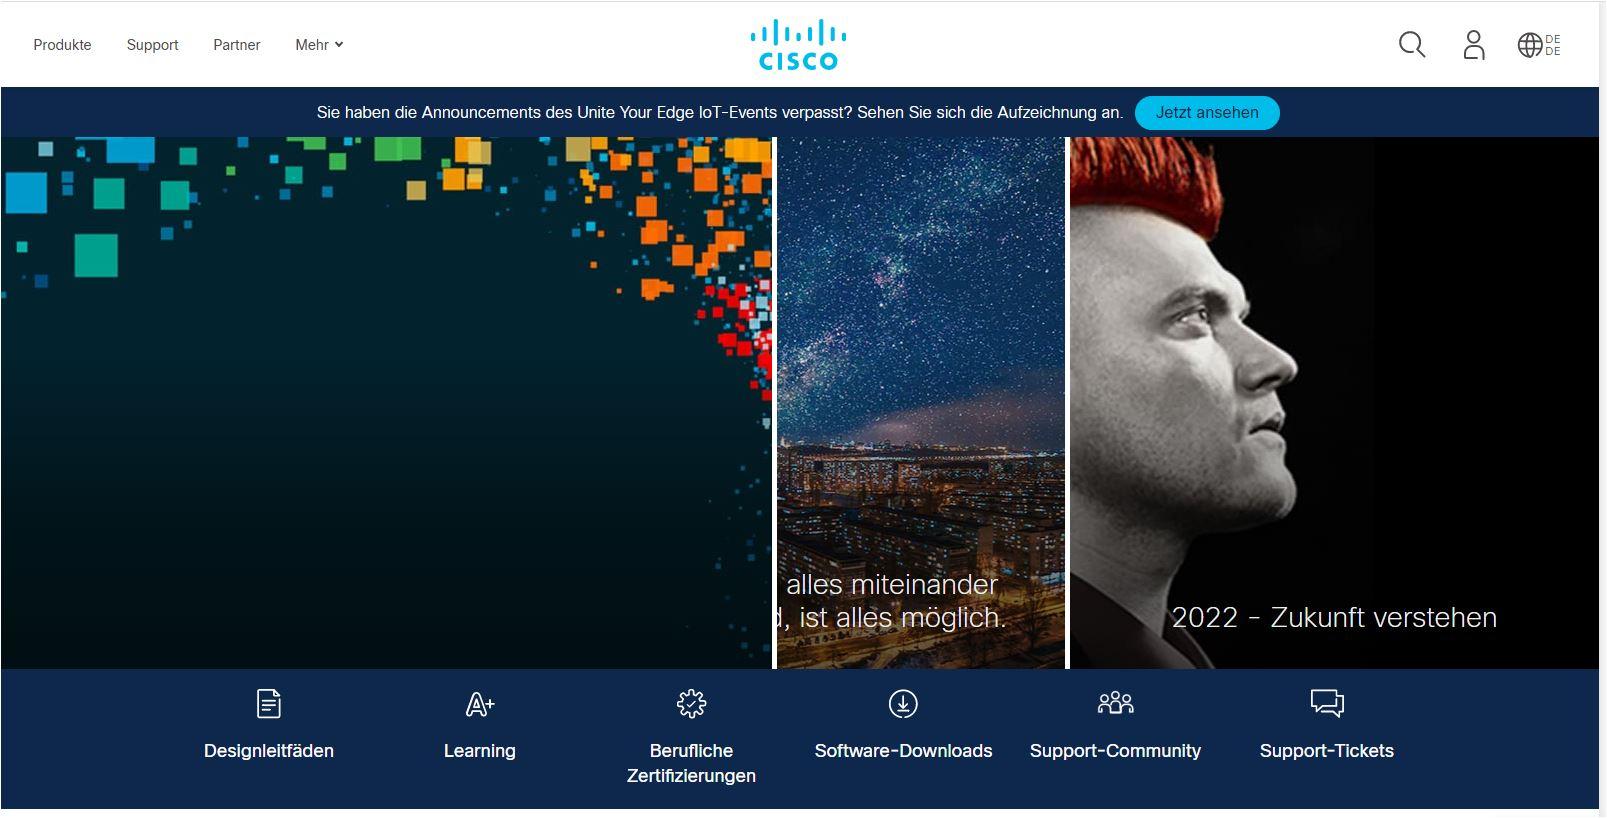 Cisco_B2B Content Marketing